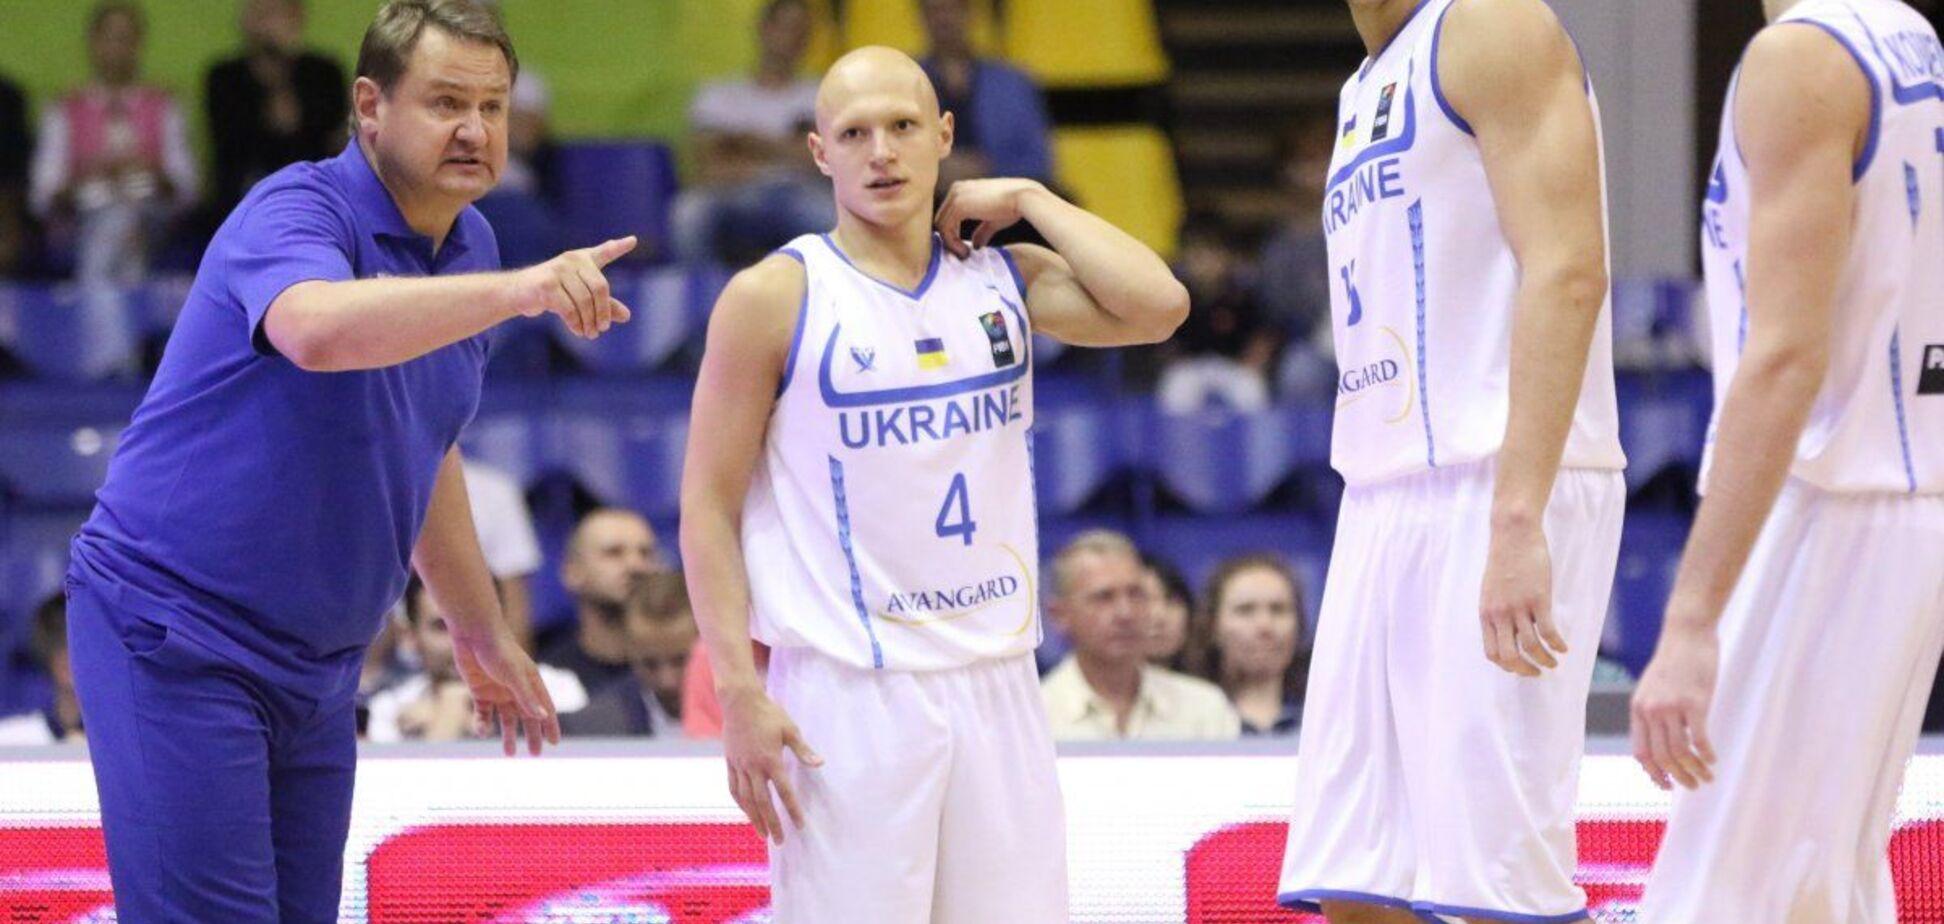 Мурзін збірна України